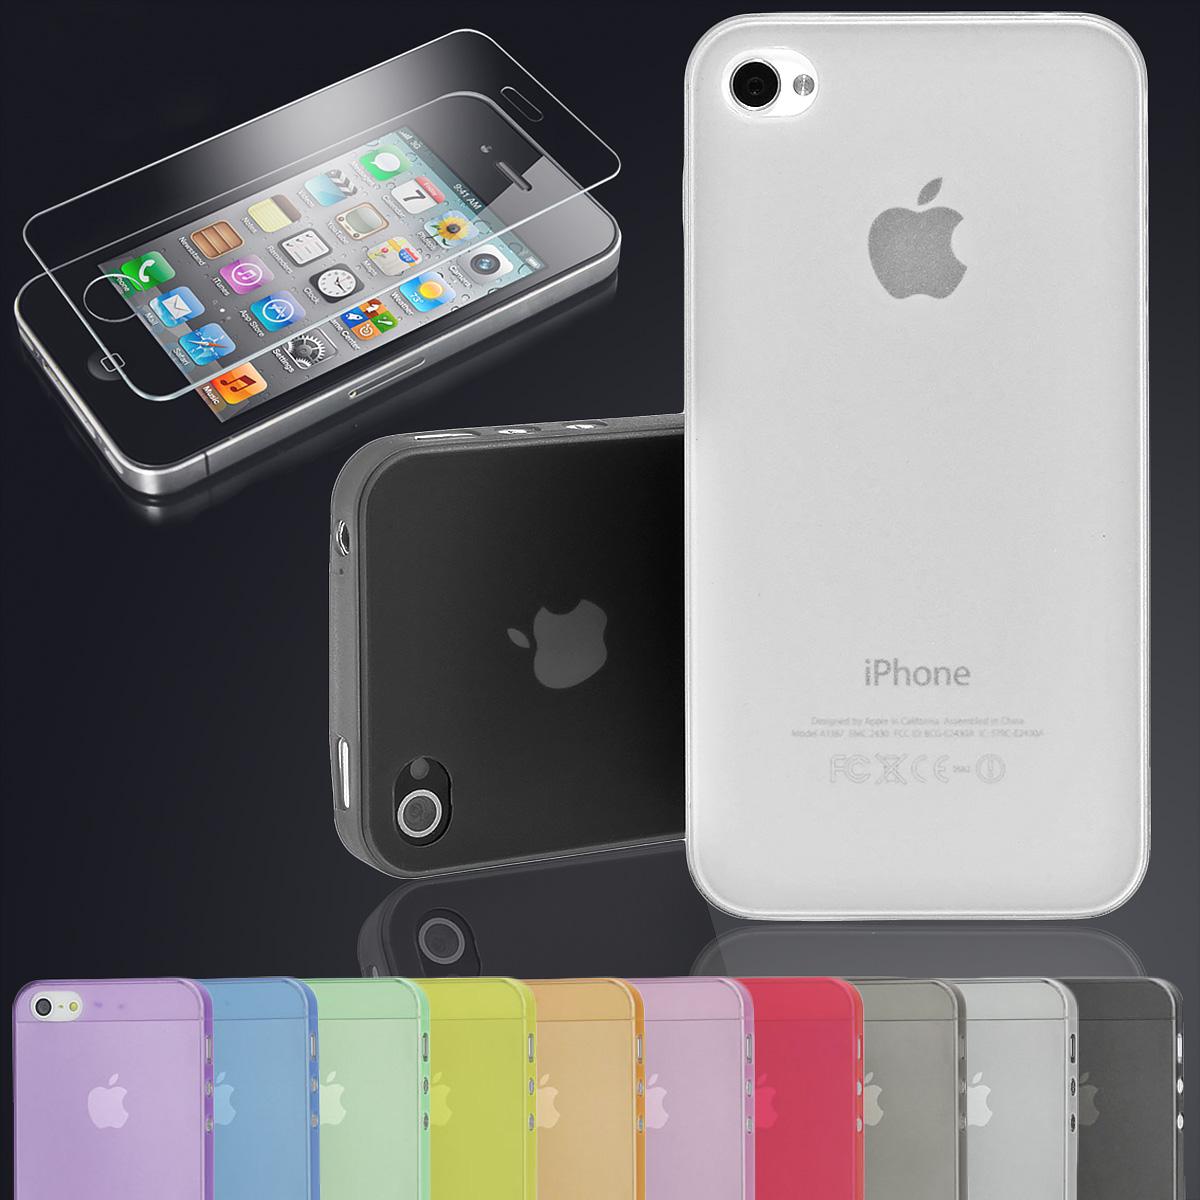 apple iphone 4s 5 5s 6 6s ultra d nn schutzh lle 0 3mm bumper back cover case ebay. Black Bedroom Furniture Sets. Home Design Ideas